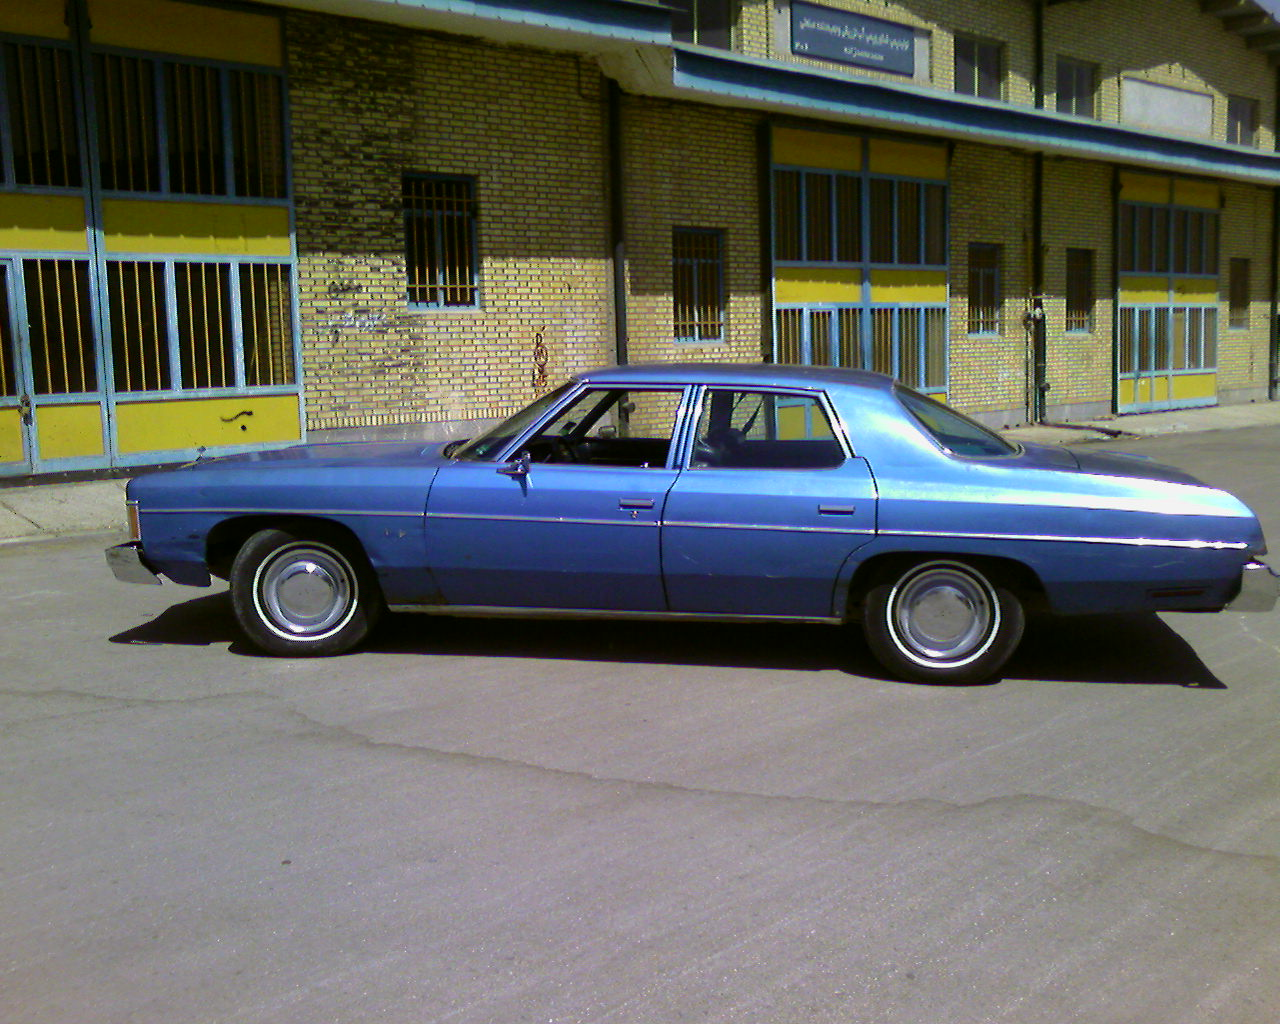 hight resolution of file 1974 chevrolet impala right side jpg